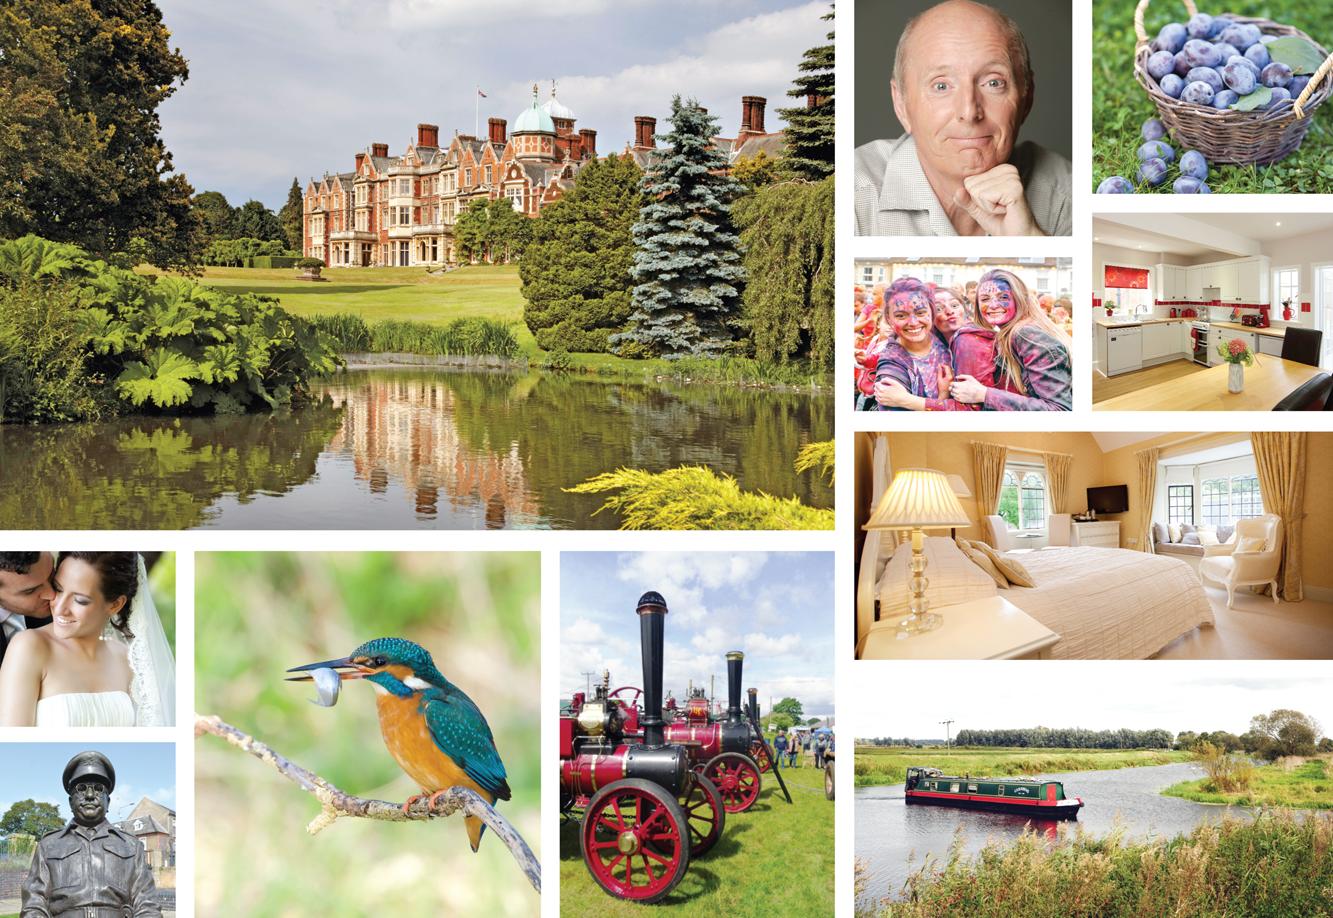 Suffolk Norfolk Life Magazine September 2015 Sandringham House, Jasper Carrott, Woolpit Steam Rally, Weddings, Competition